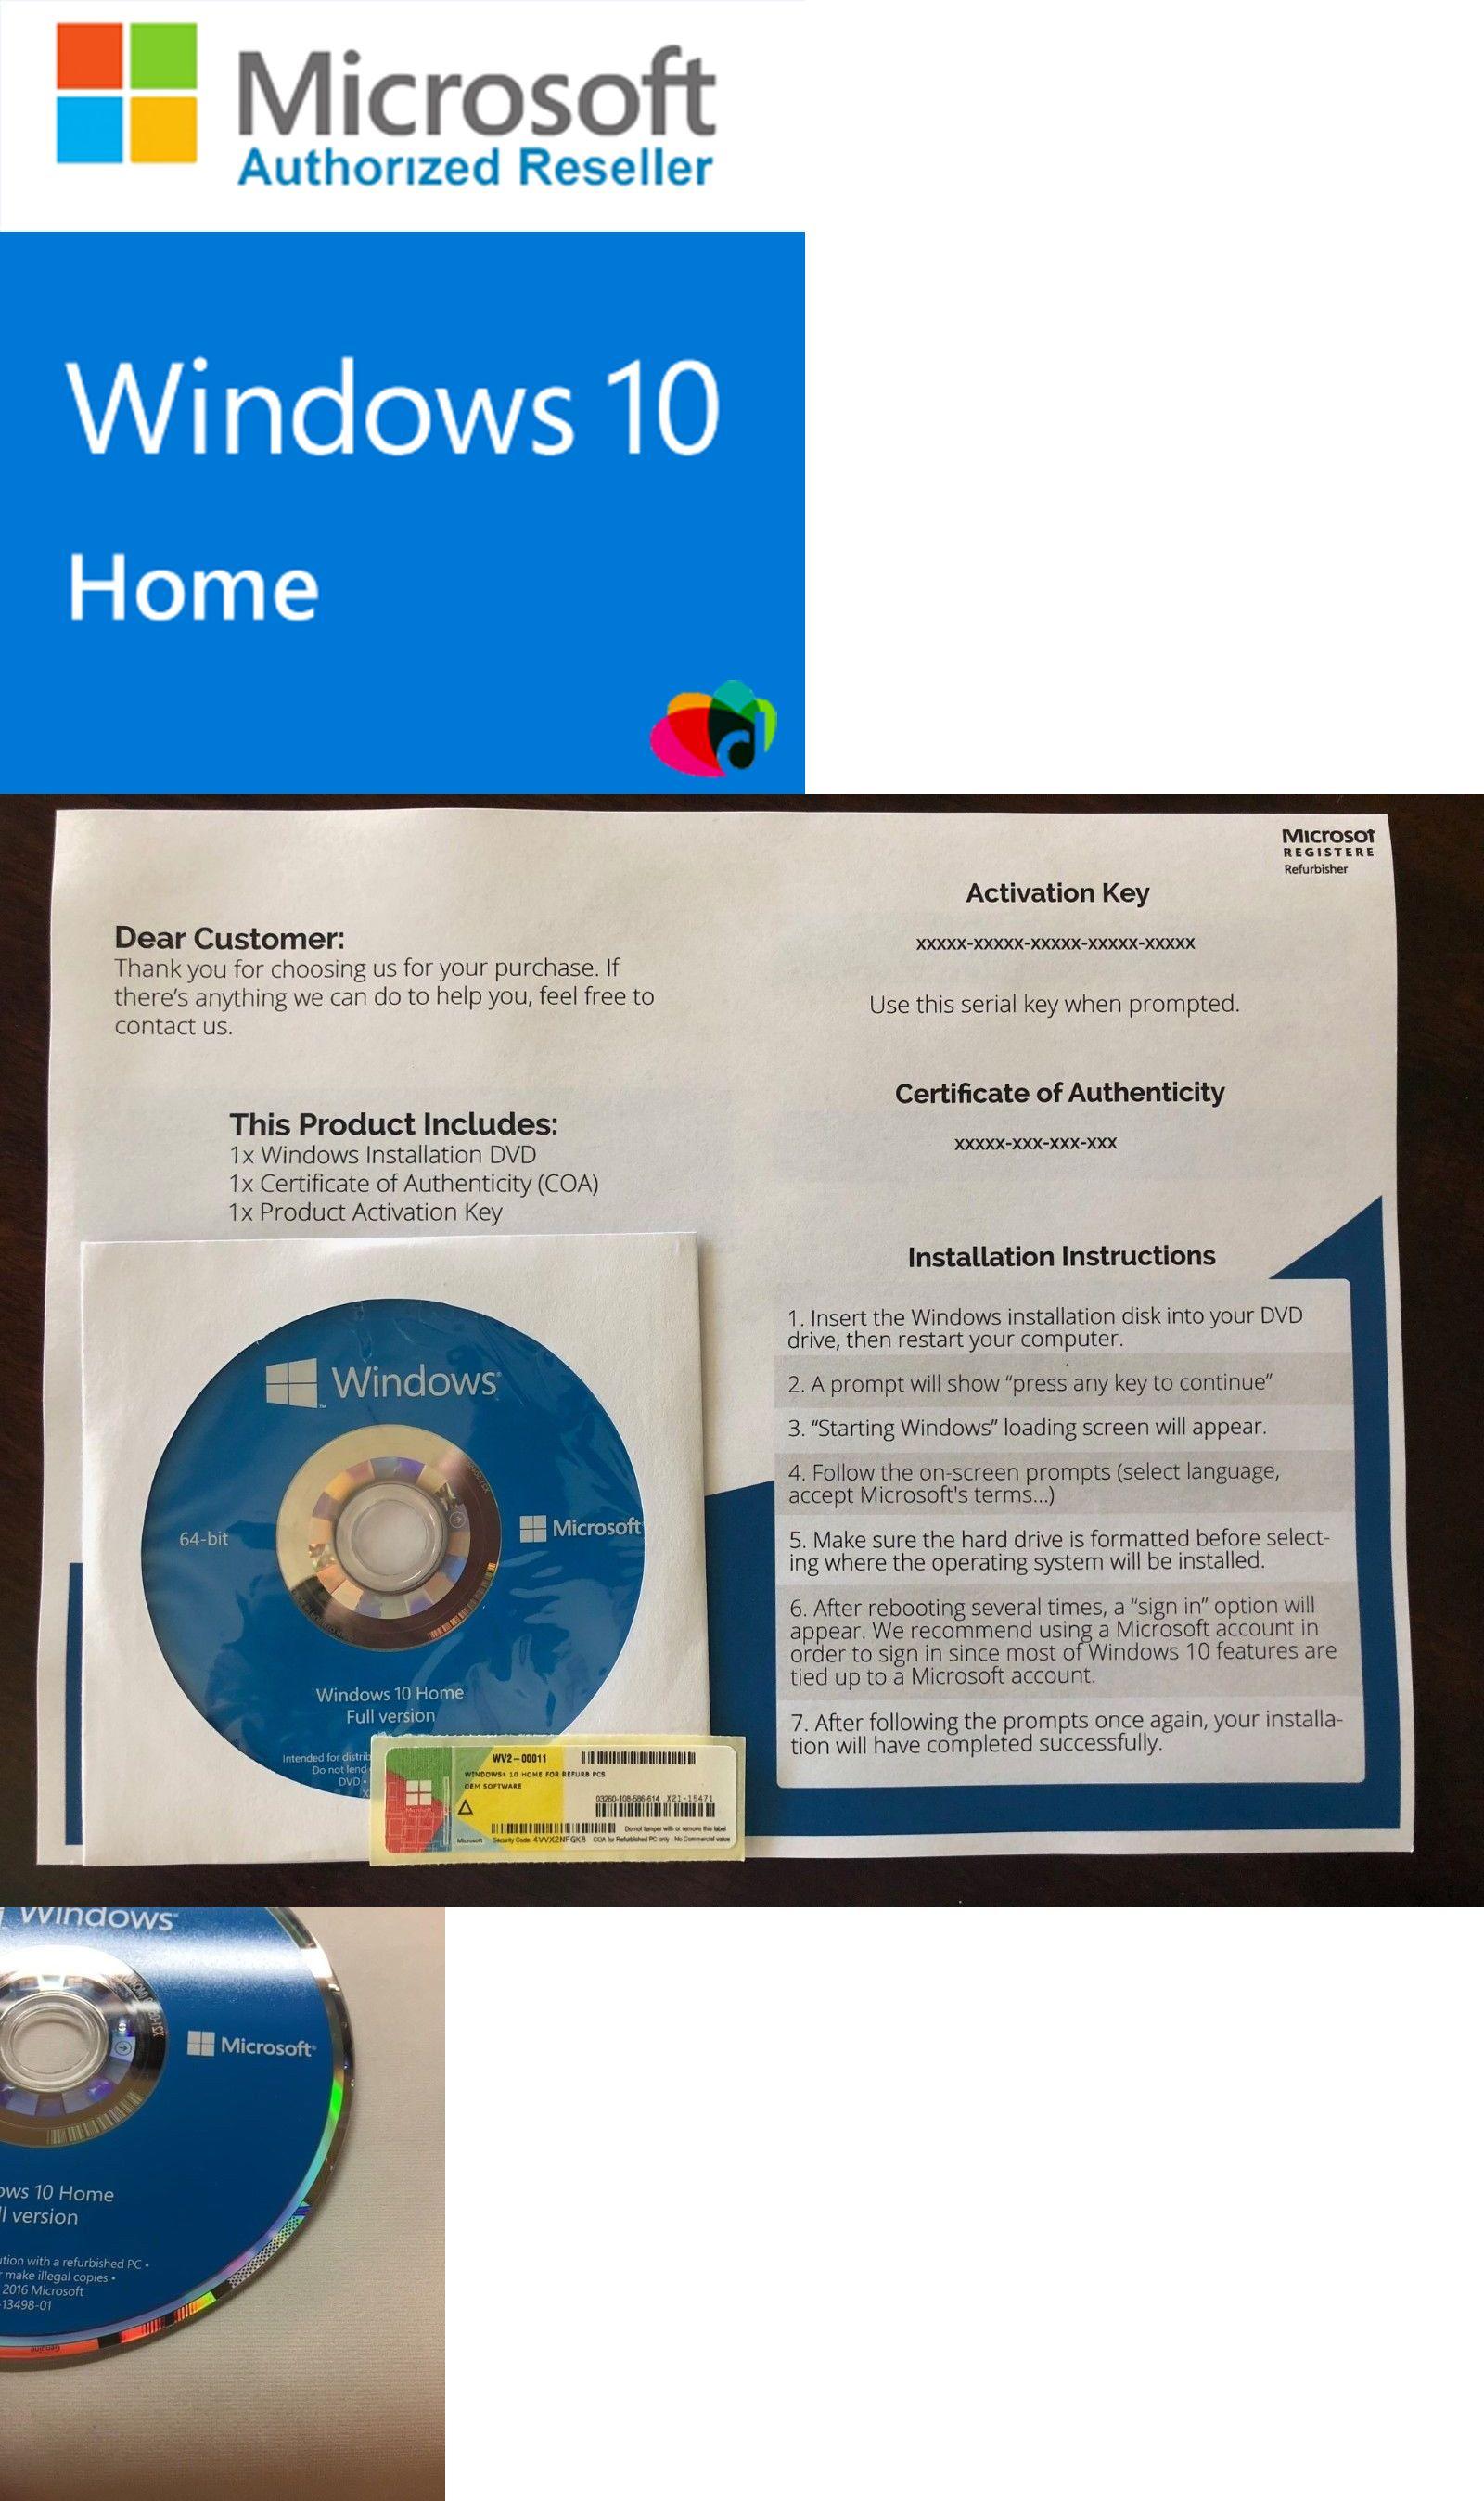 microsoft windows 10 operating system purchase